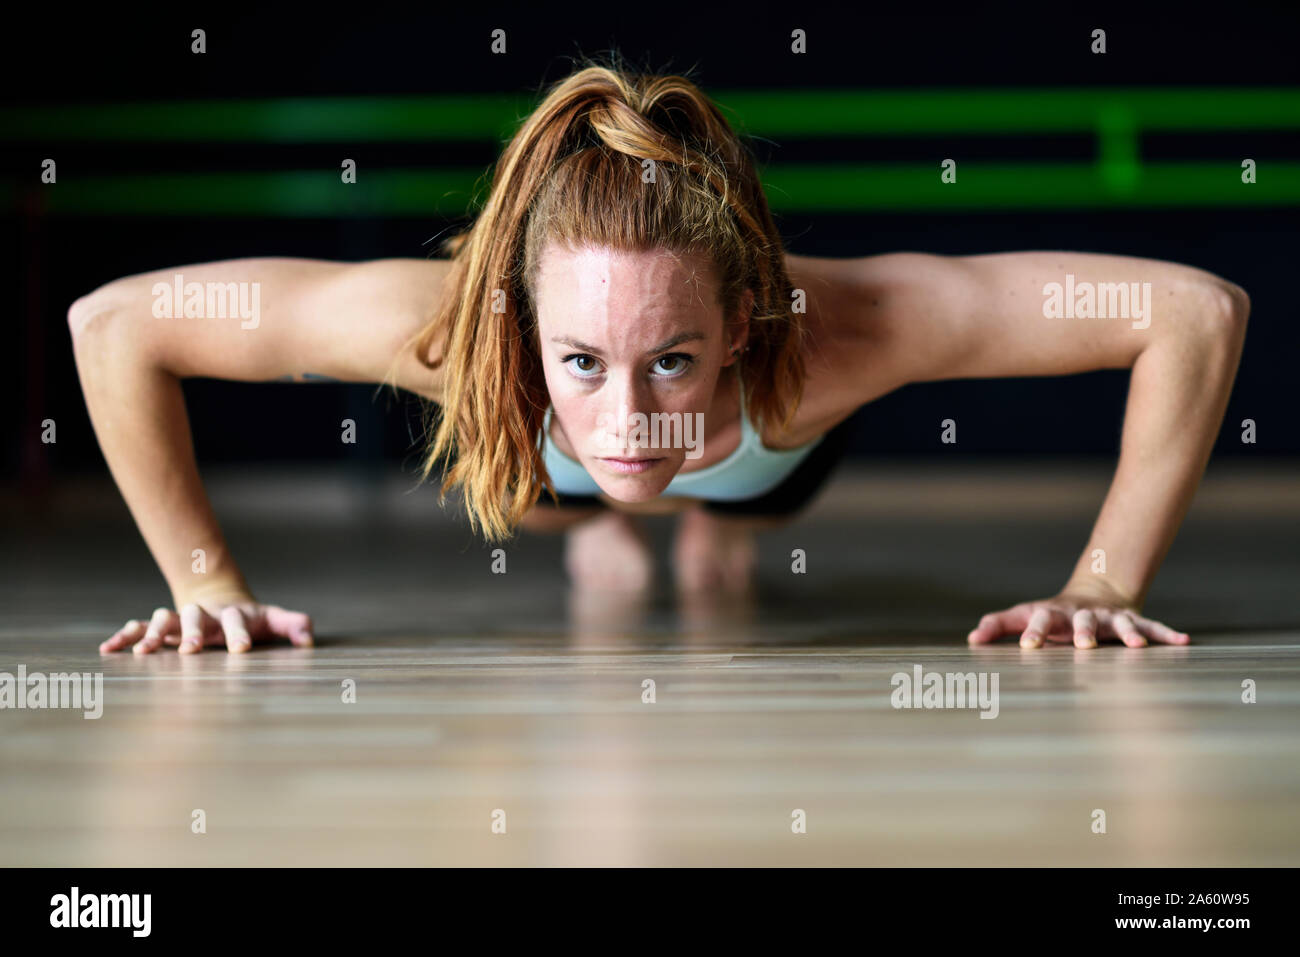 Sporty young woman doing push-ups dans une salle d'exercice Banque D'Images